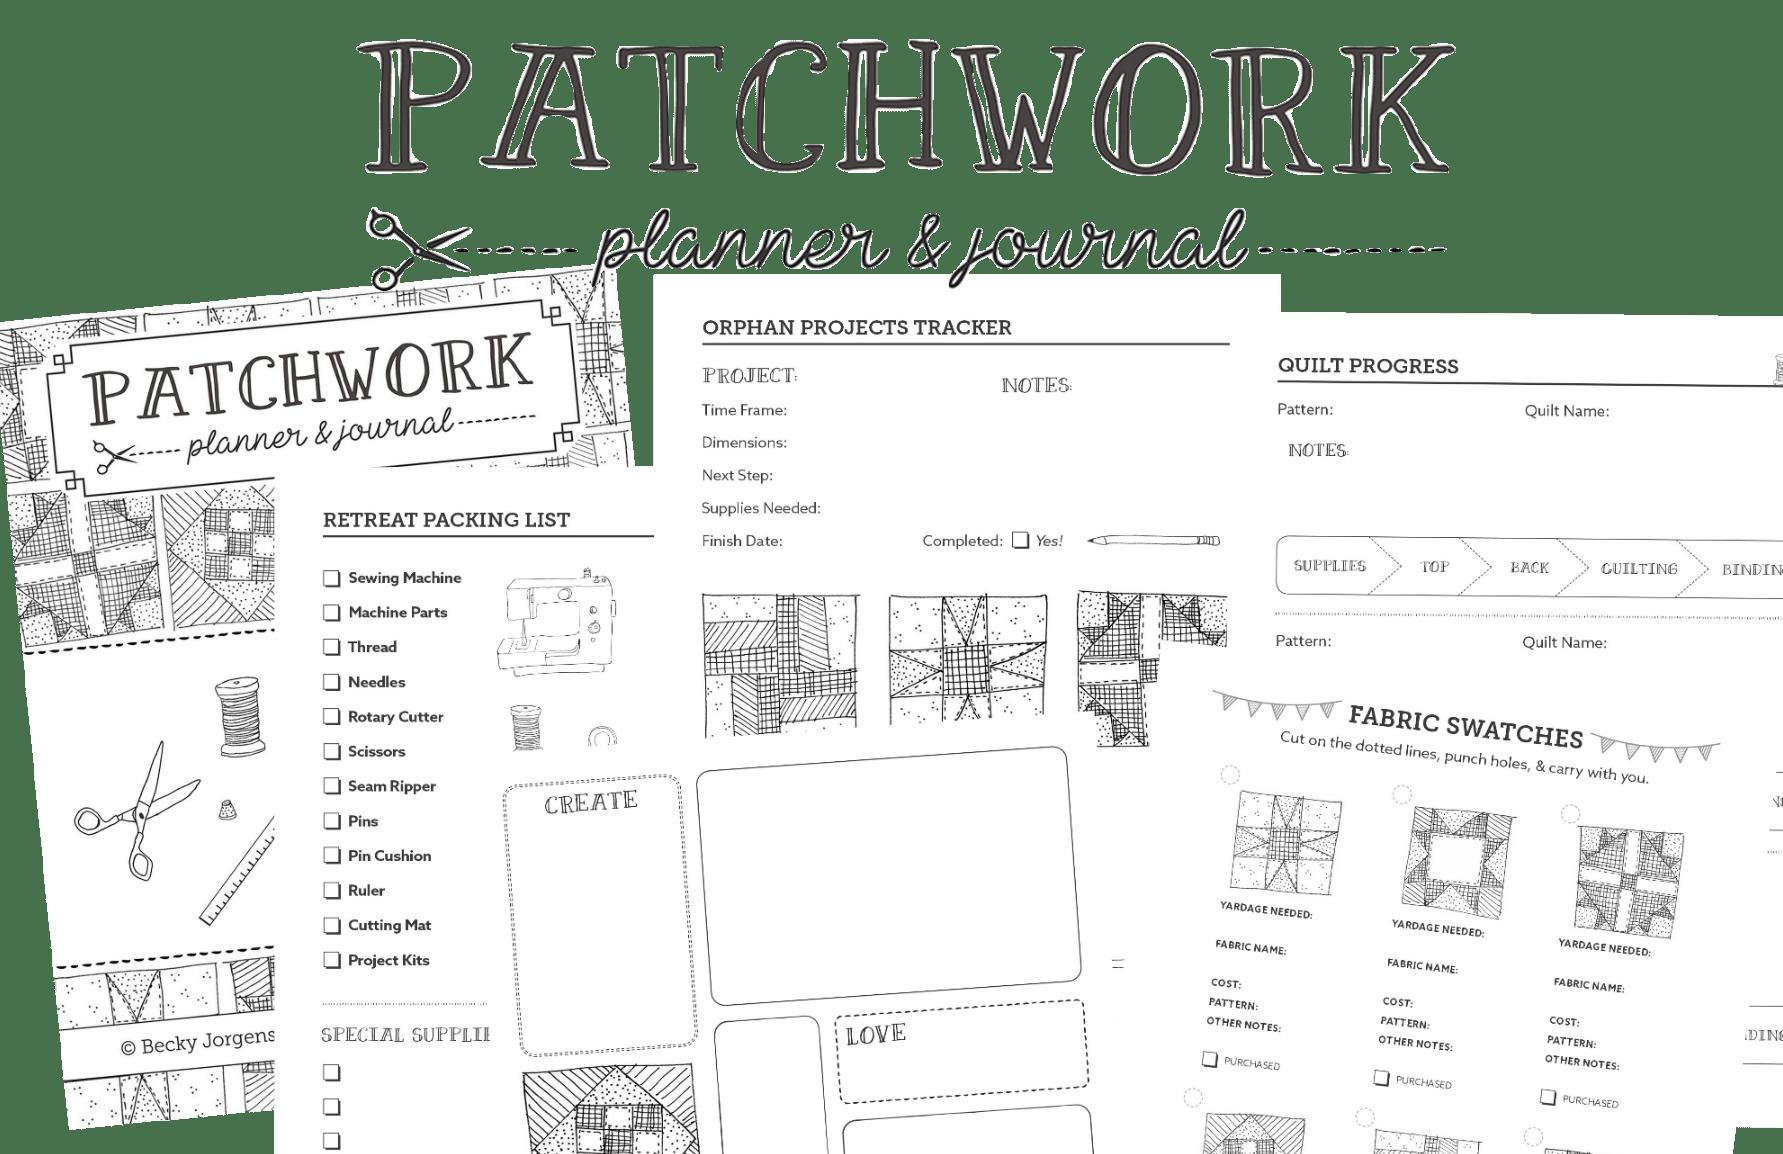 Patchwork Planner Amp Journal